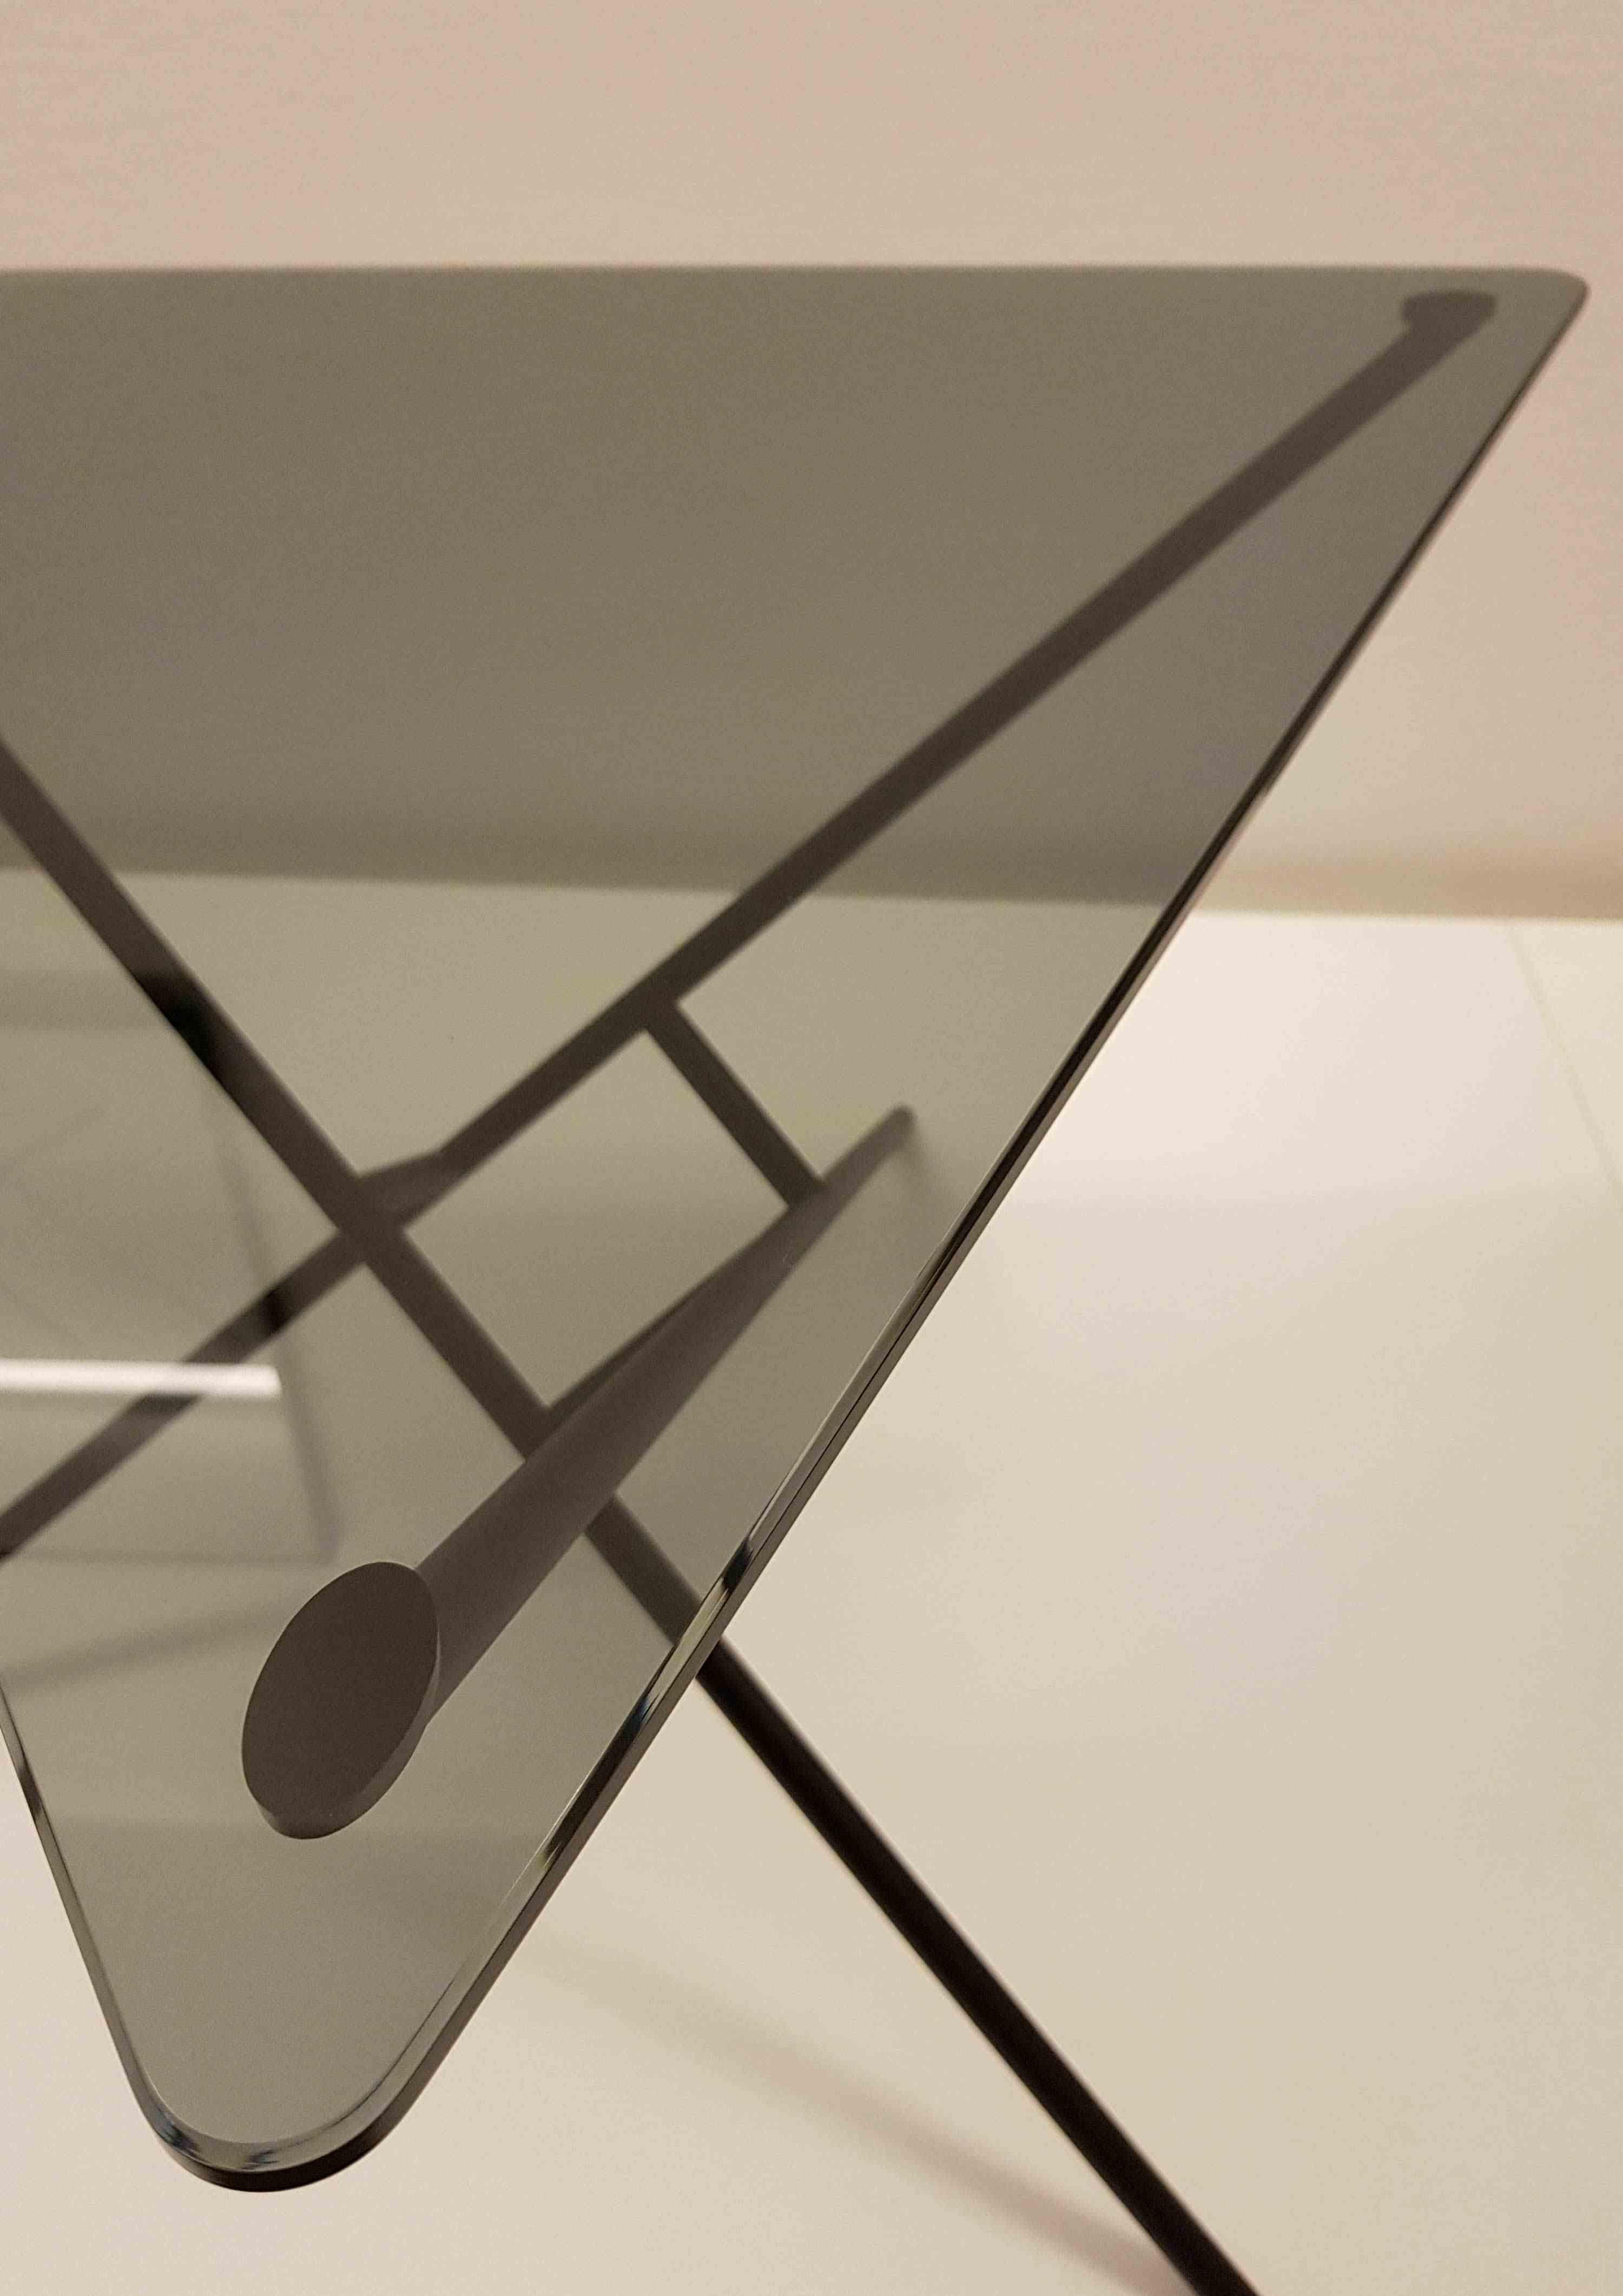 Dreieckige platte webopti